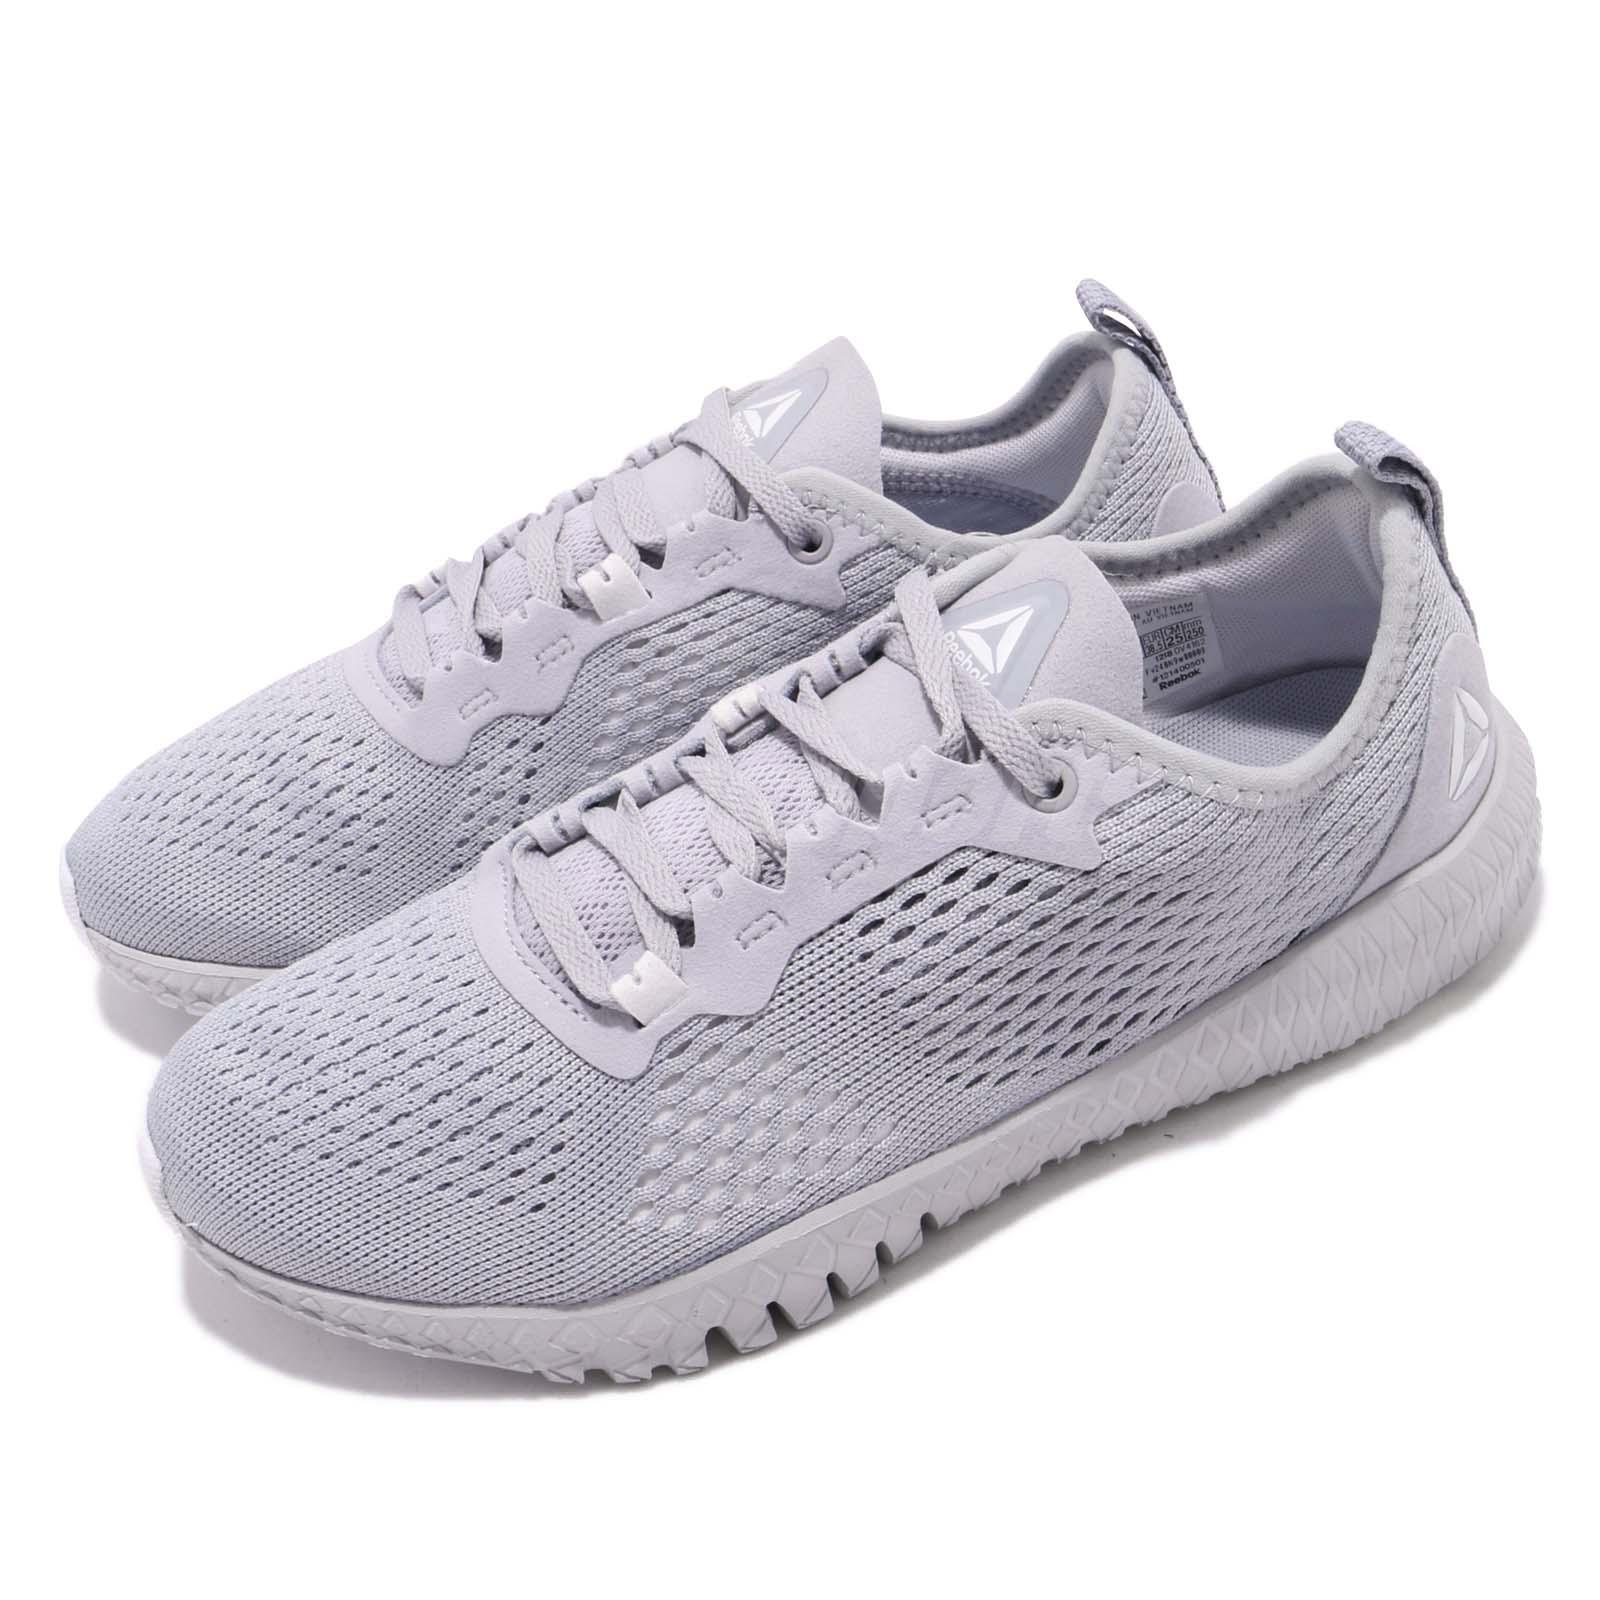 42cd923d1a4 Details about Reebok Flexagon Grey White Women Workout Cross Training Shoes  Sneakers DV4162